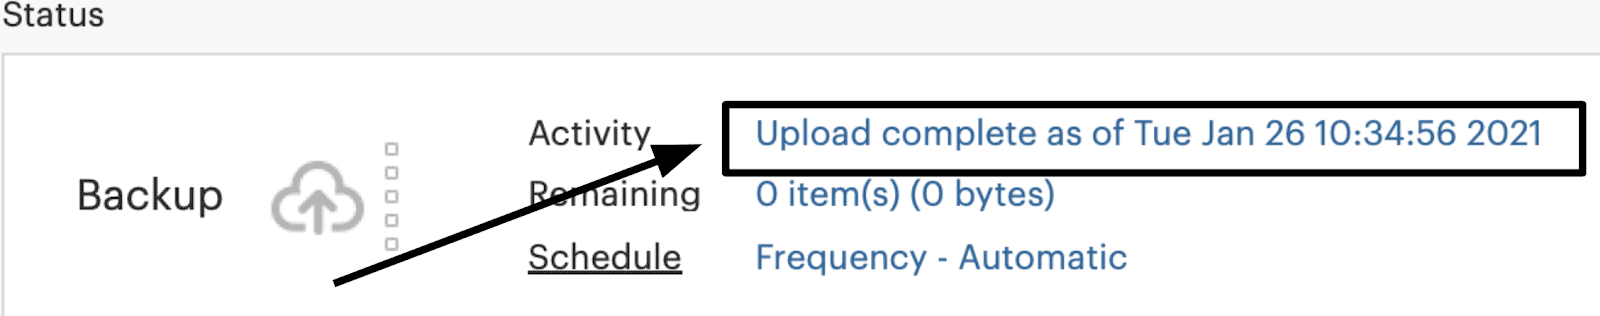 SpiderOak One upload complete notification